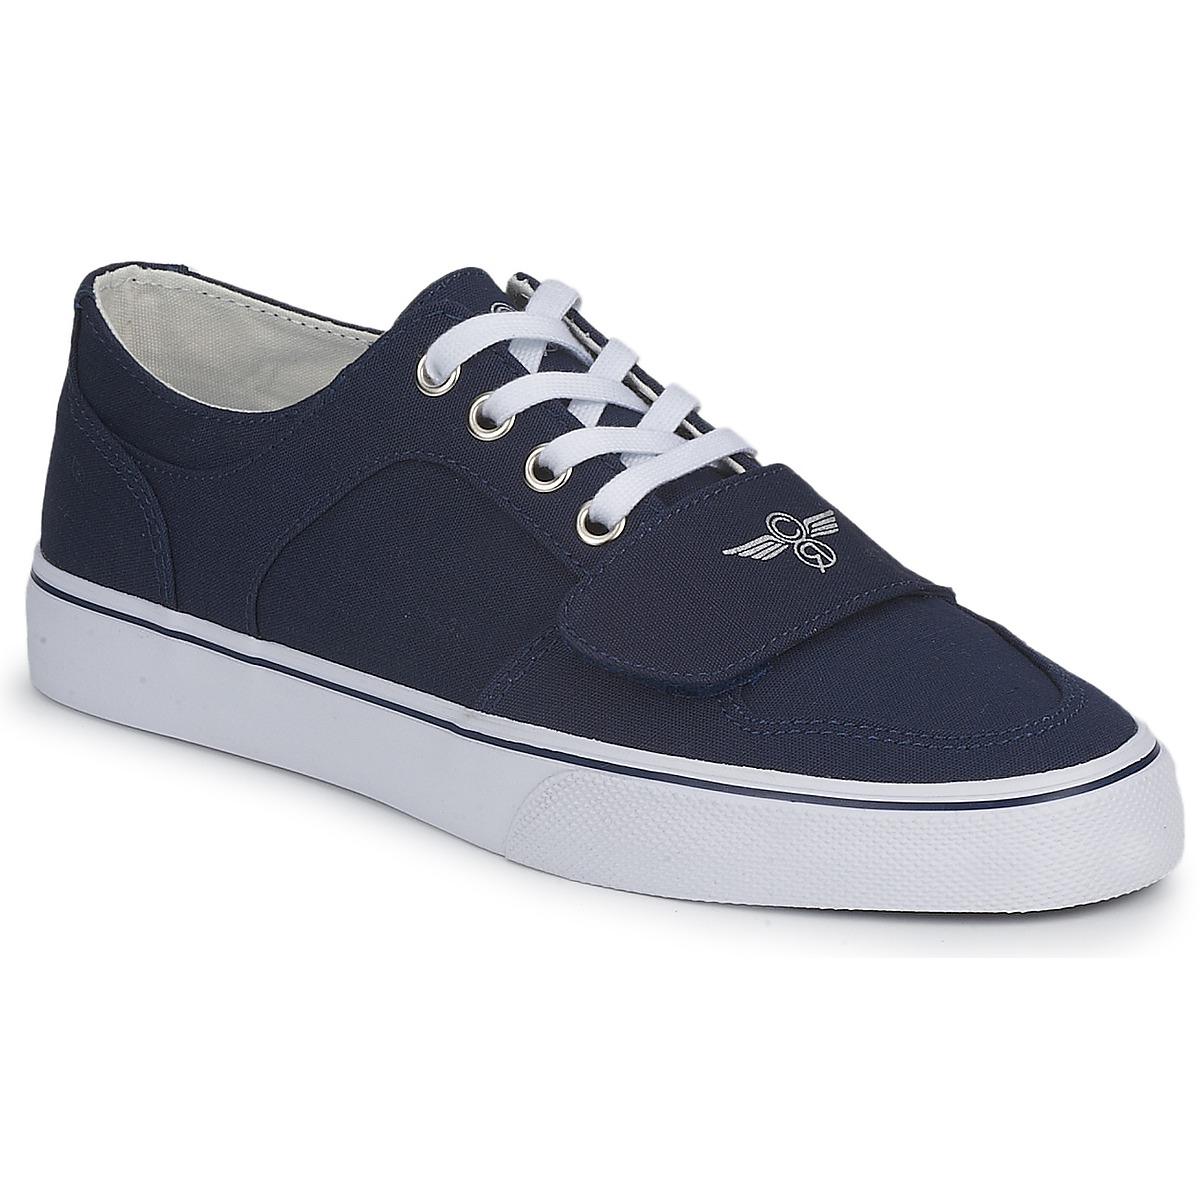 Creative Recreation G C CESARIO LO XVI Navy - Kostenloser Versand bei Spartoode ! - Schuhe Sneaker Low  34,50 €